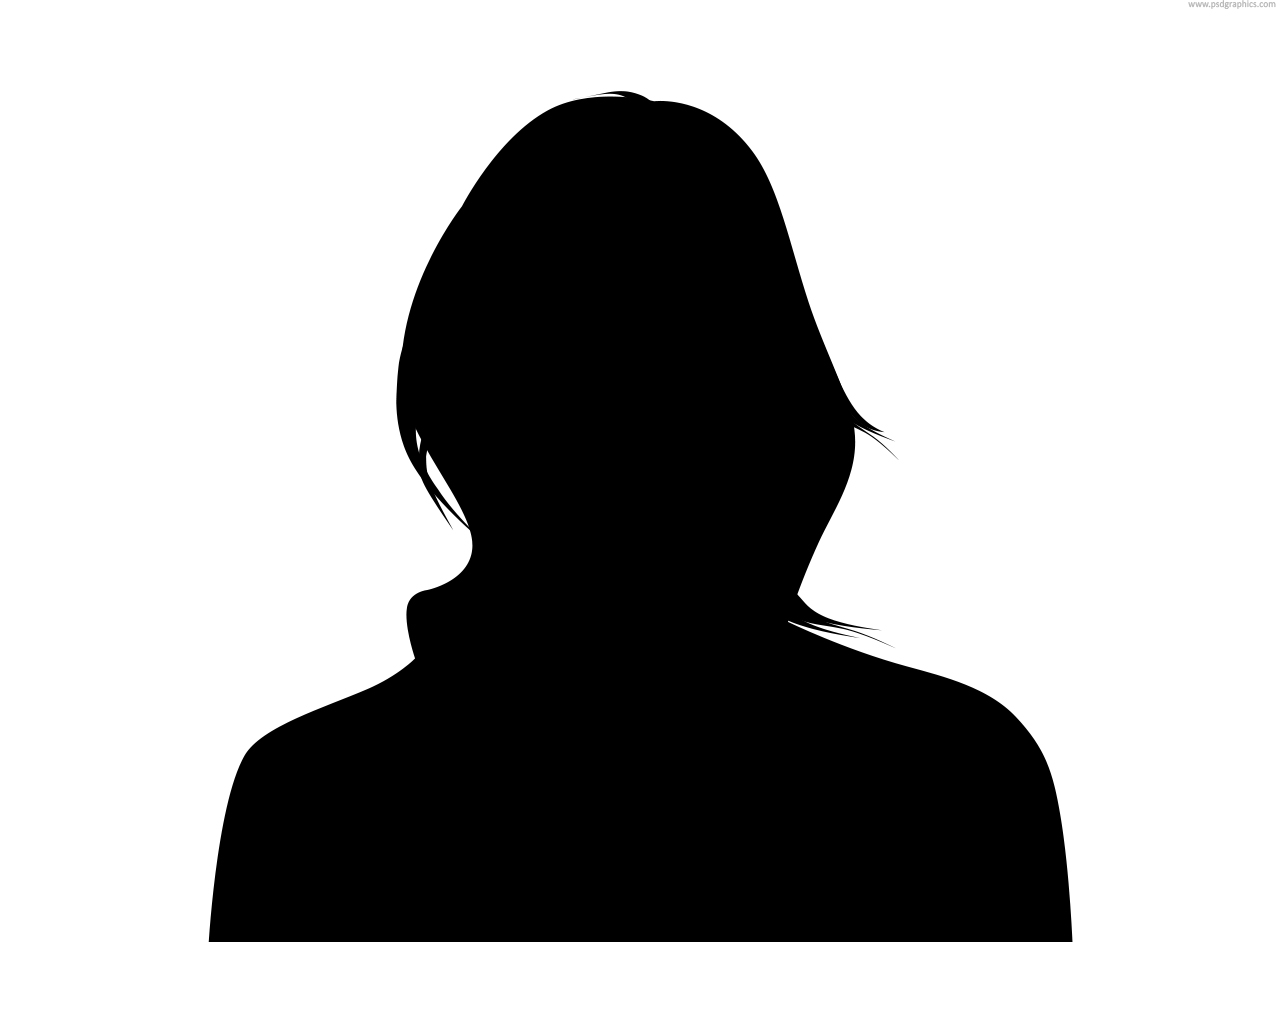 1280x1024 Female Silhouette Parkend Primary School